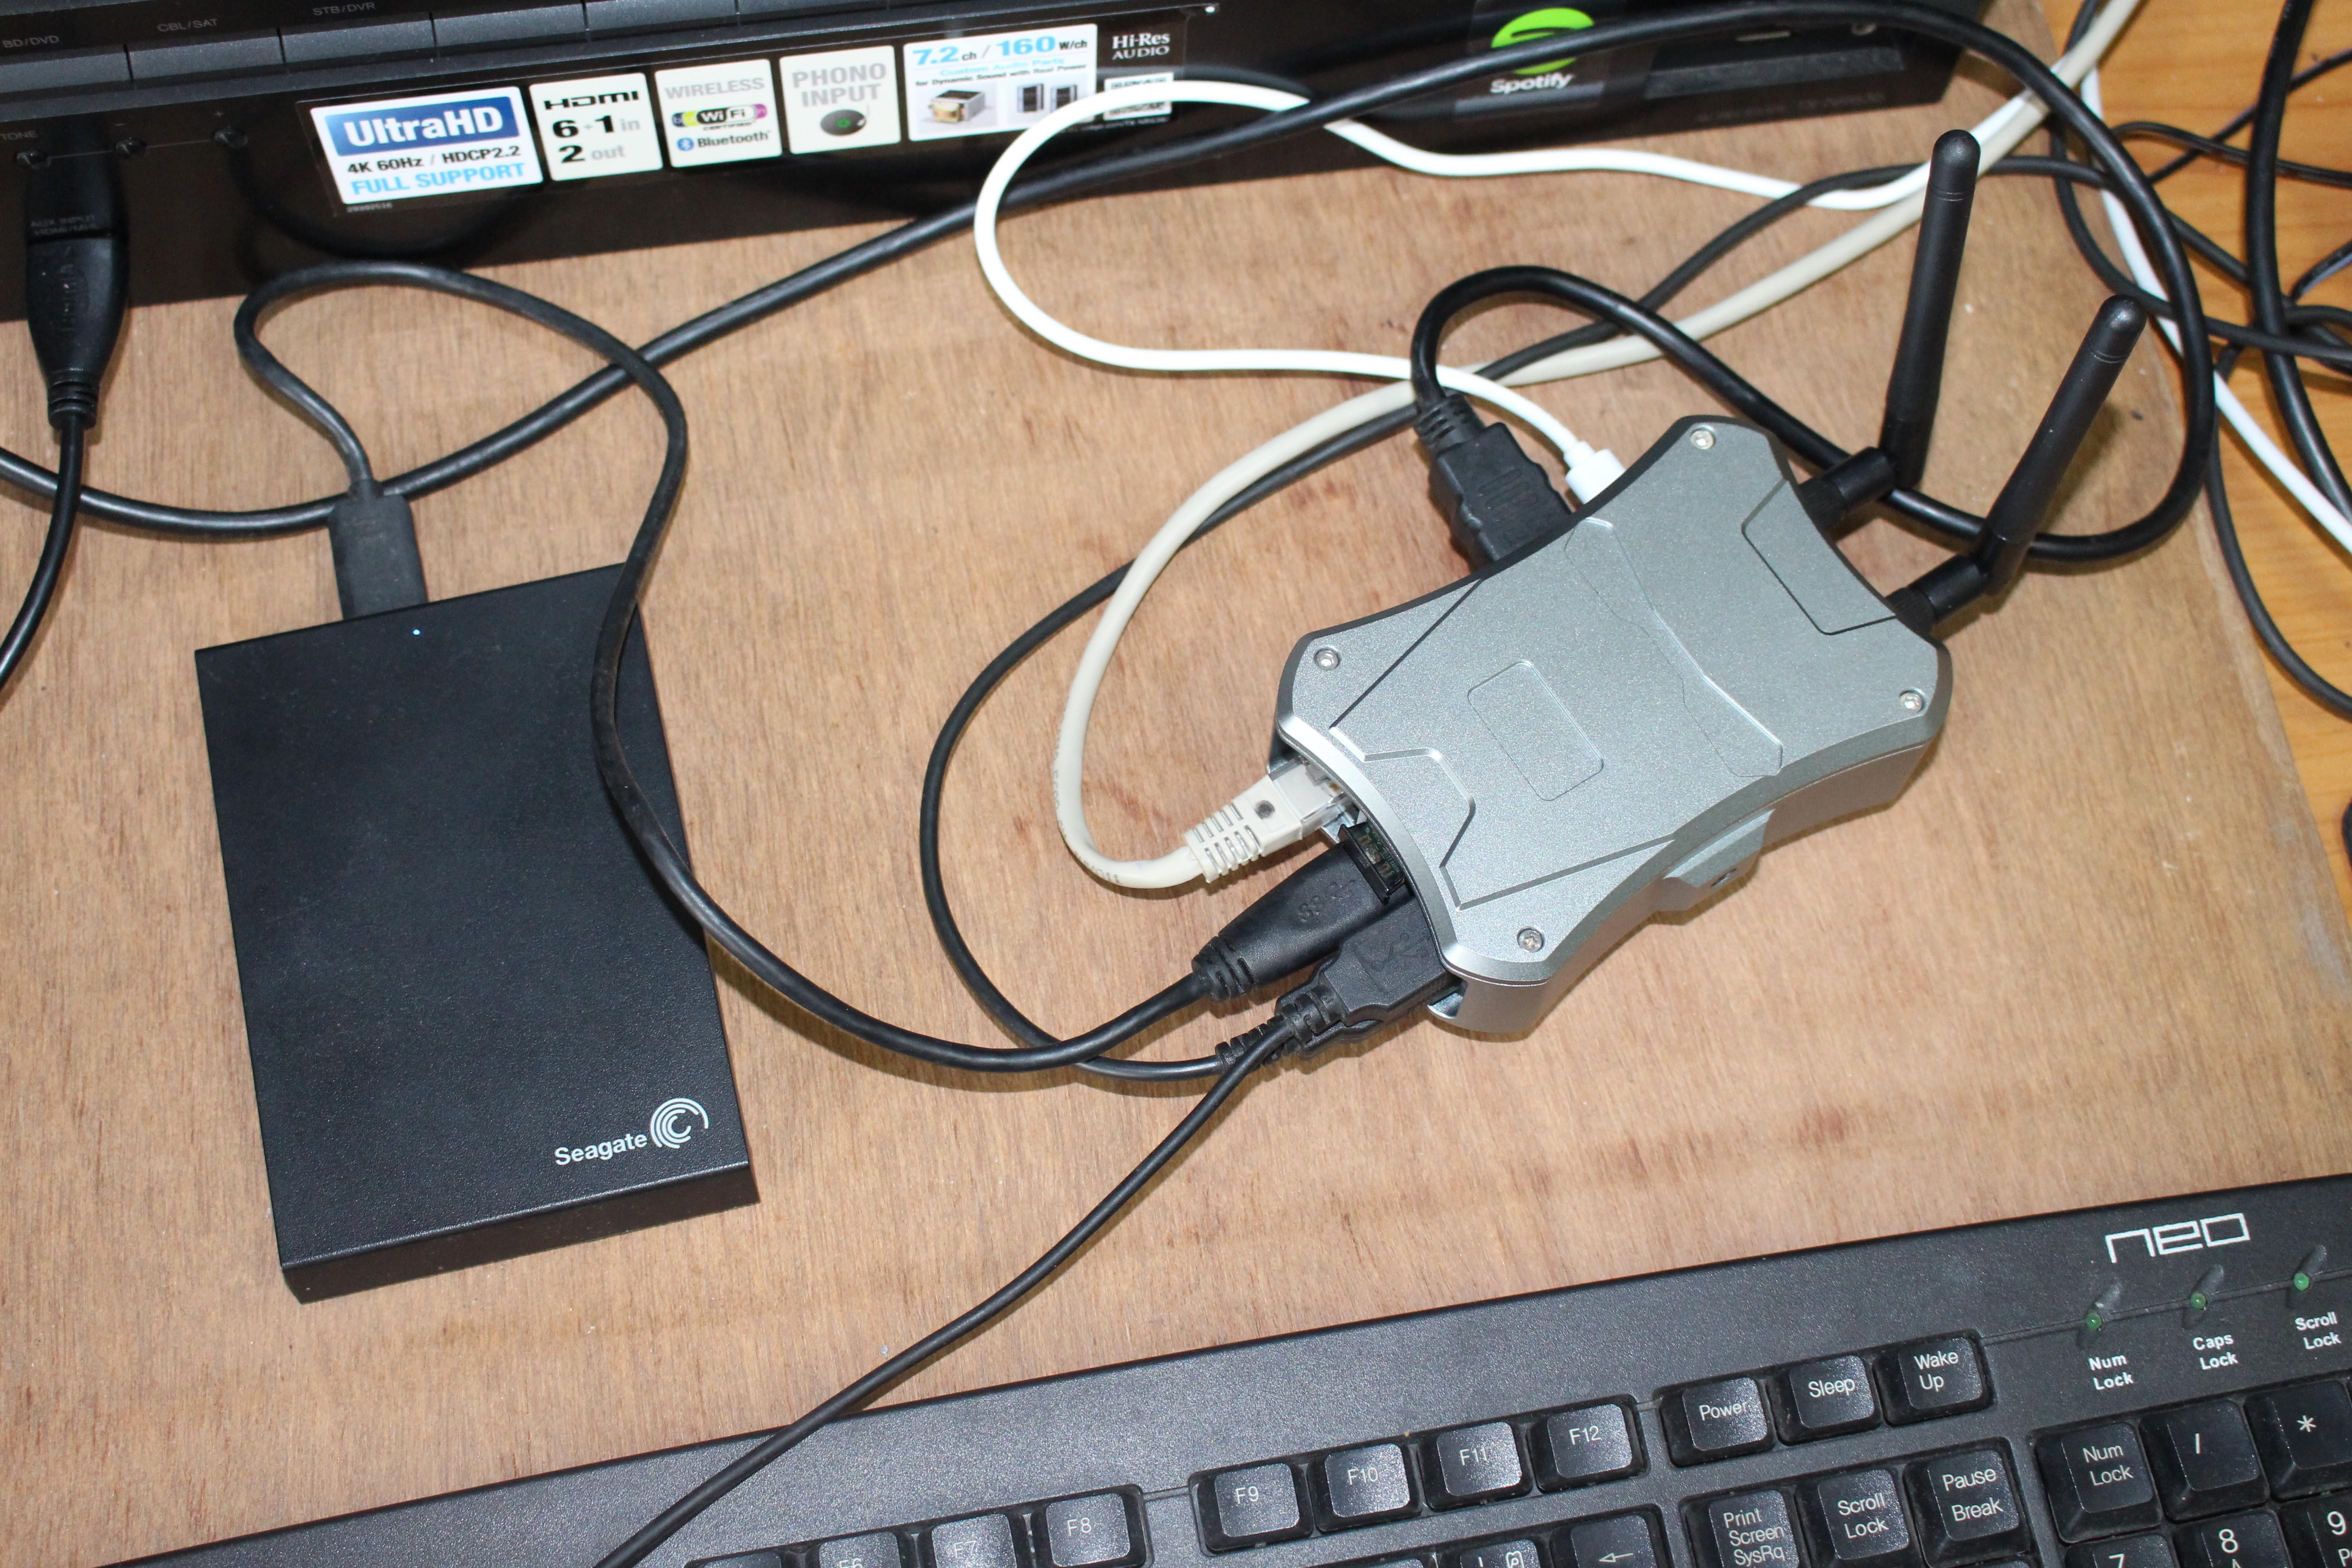 NanoPi M4V2 Kit Review - Part 2: FriendlyCore Desktop